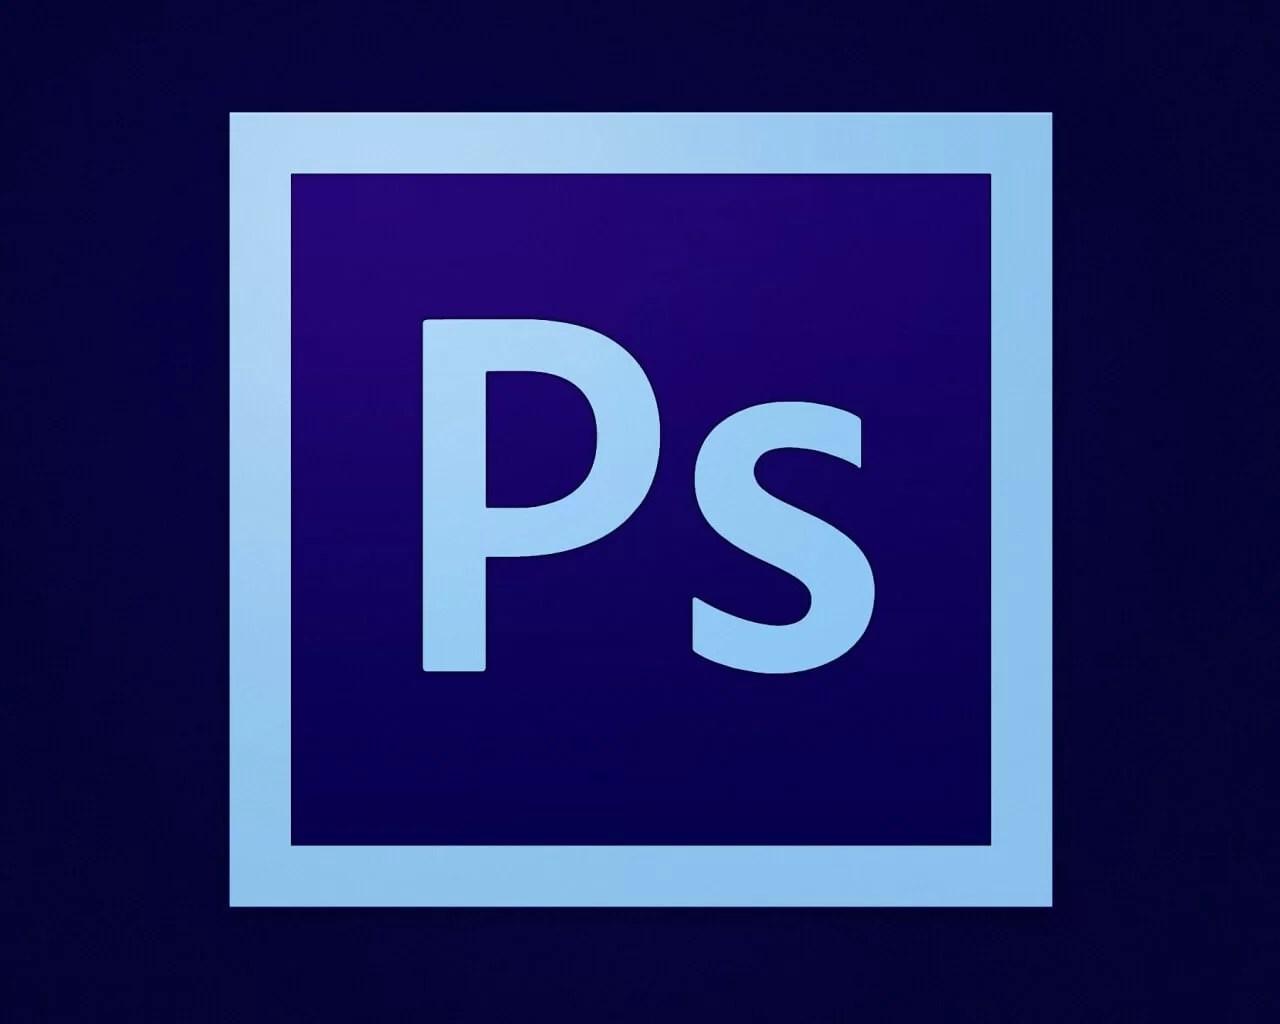 Adobe-Photoshop-CC-2015-(20150529-r-88)-(32-64Bit)--45golkes